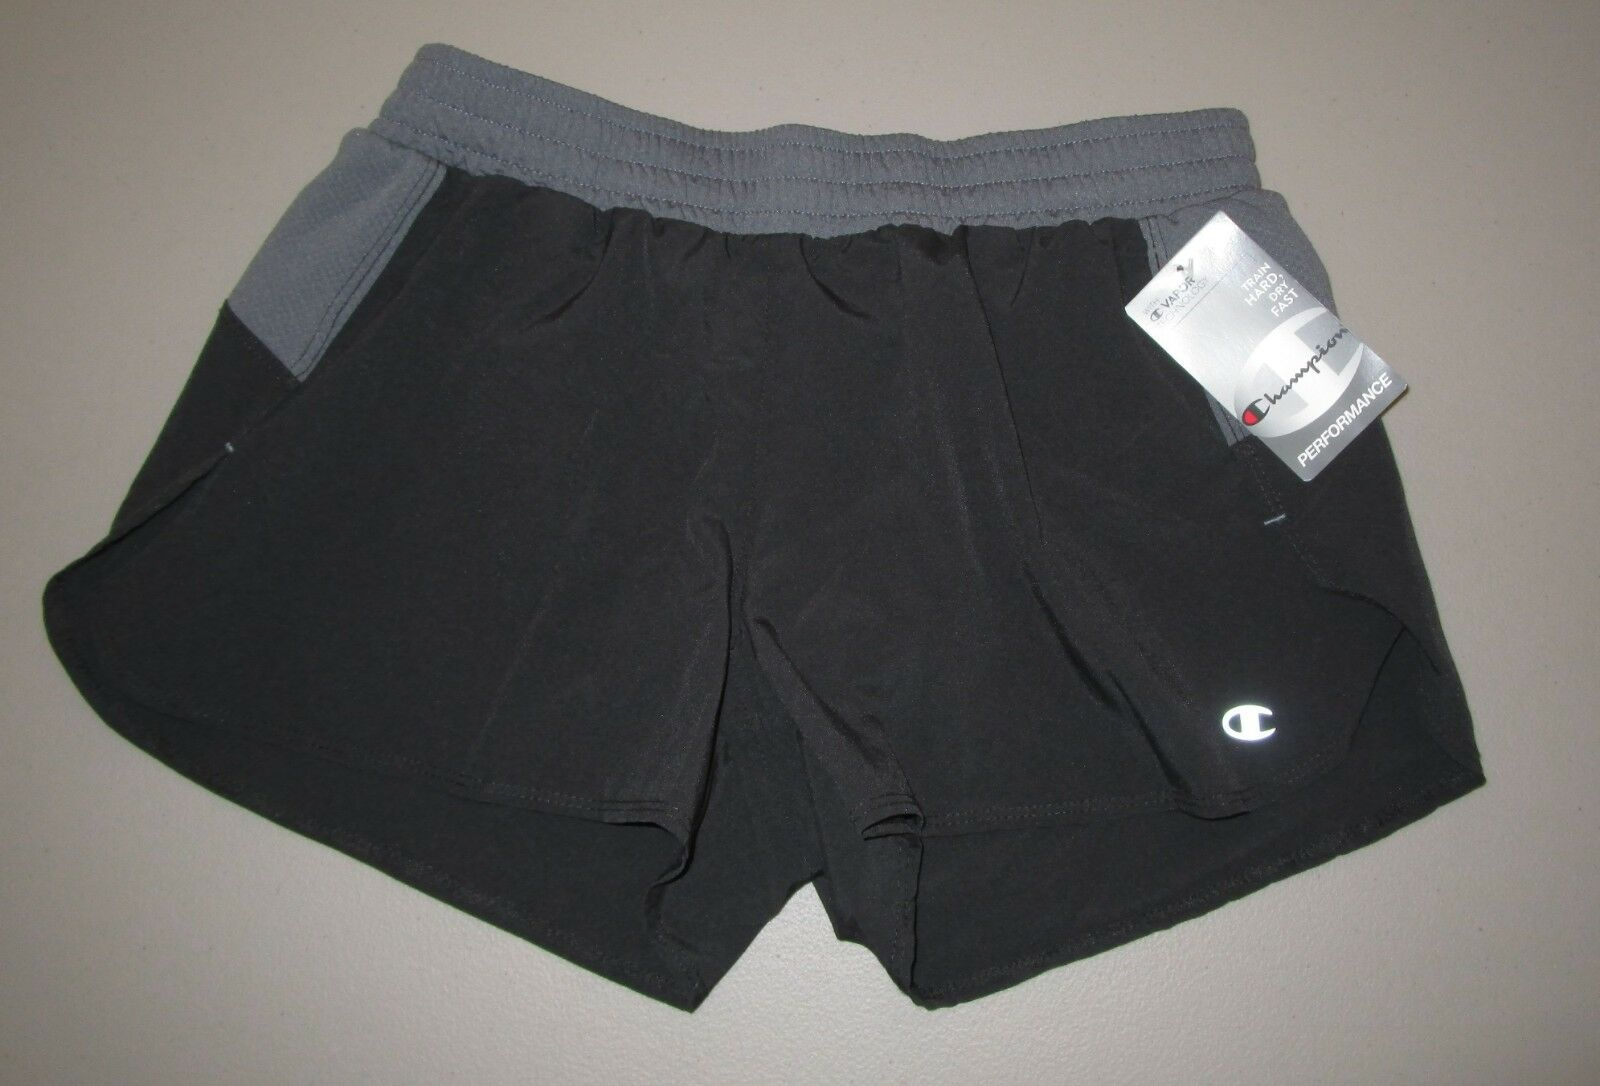 2ef3be6106 2 Champion Women's Sport Shorts 5 M0570 S Black/medium Grey